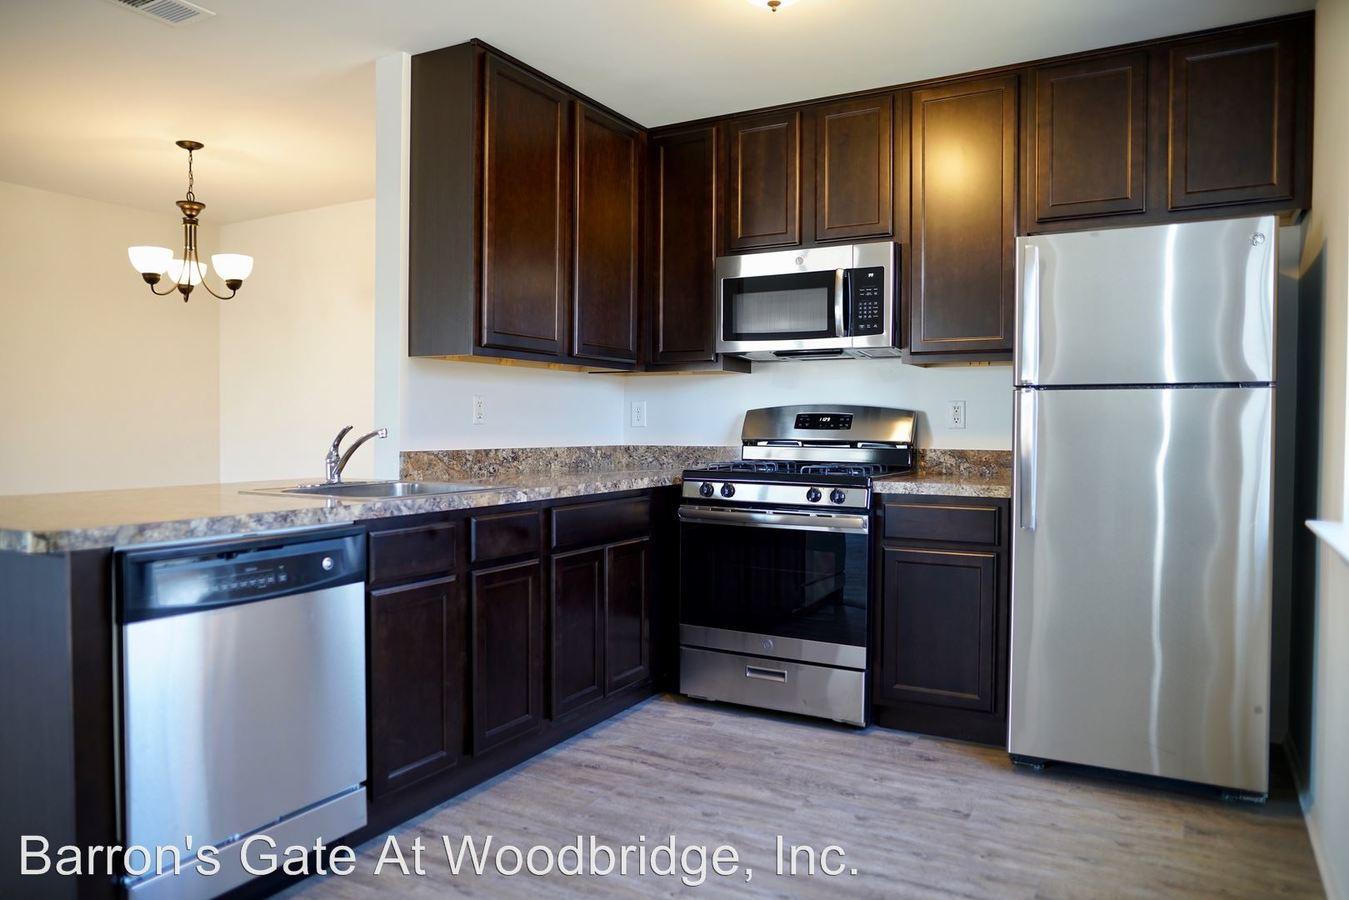 2 Bedrooms 2 Bathrooms Apartment for rent at 609 Duke Drive in Woodbridge, NJ